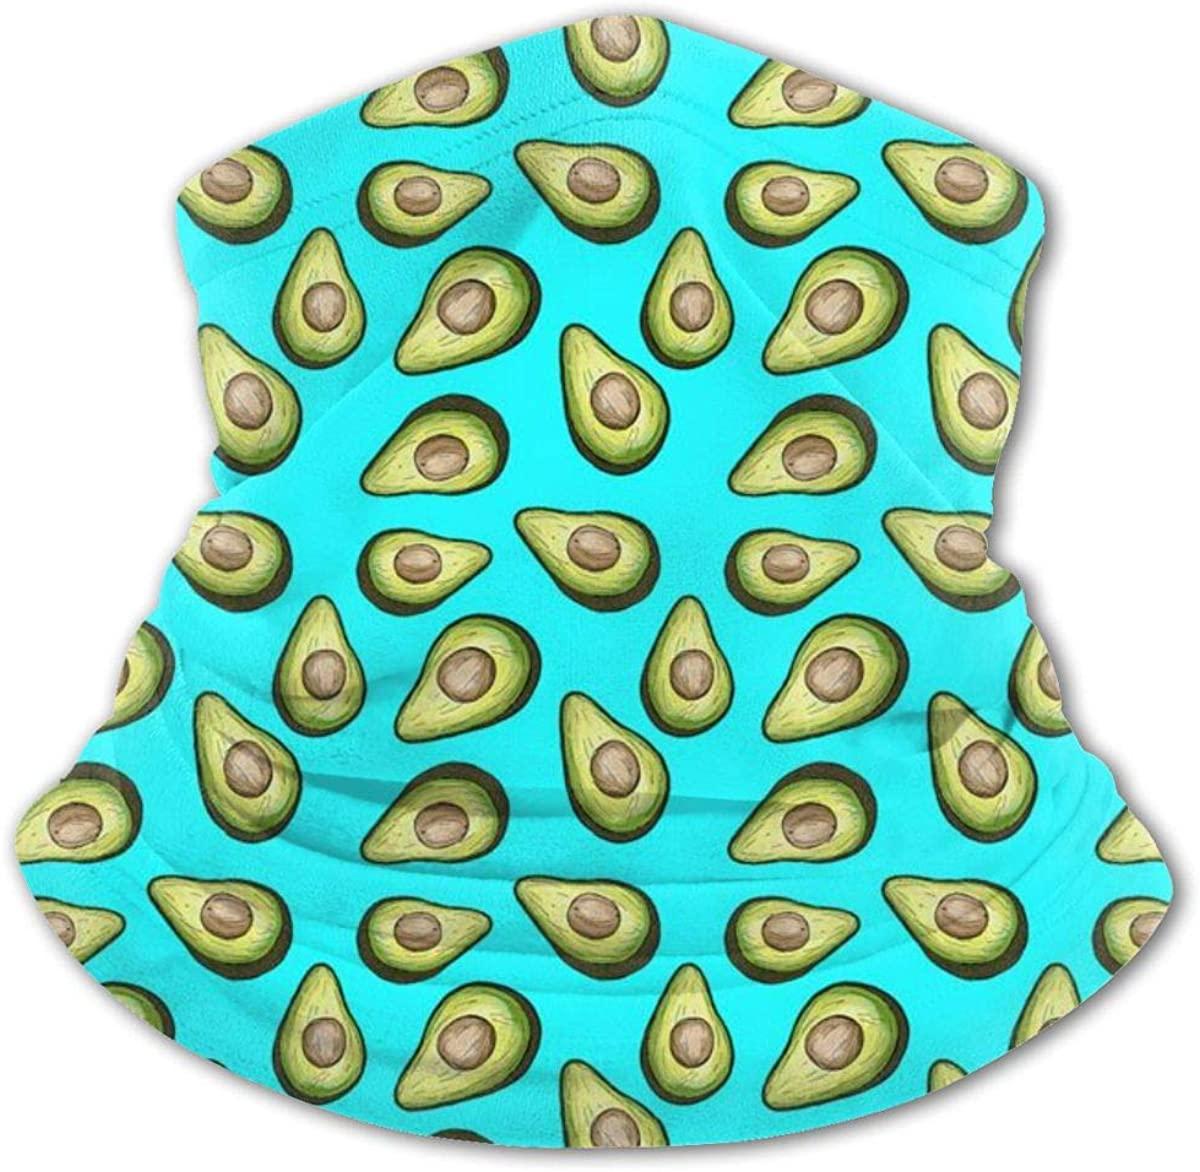 Fresh Tropical Fruit Avocado Headwear For Girls And Boys, Head Wrap, Neck Gaiter, Headband, Tenn Fishing Mask, Magic Scarf, Tube Mask, Face Bandana Mask For Camping Running Cycling